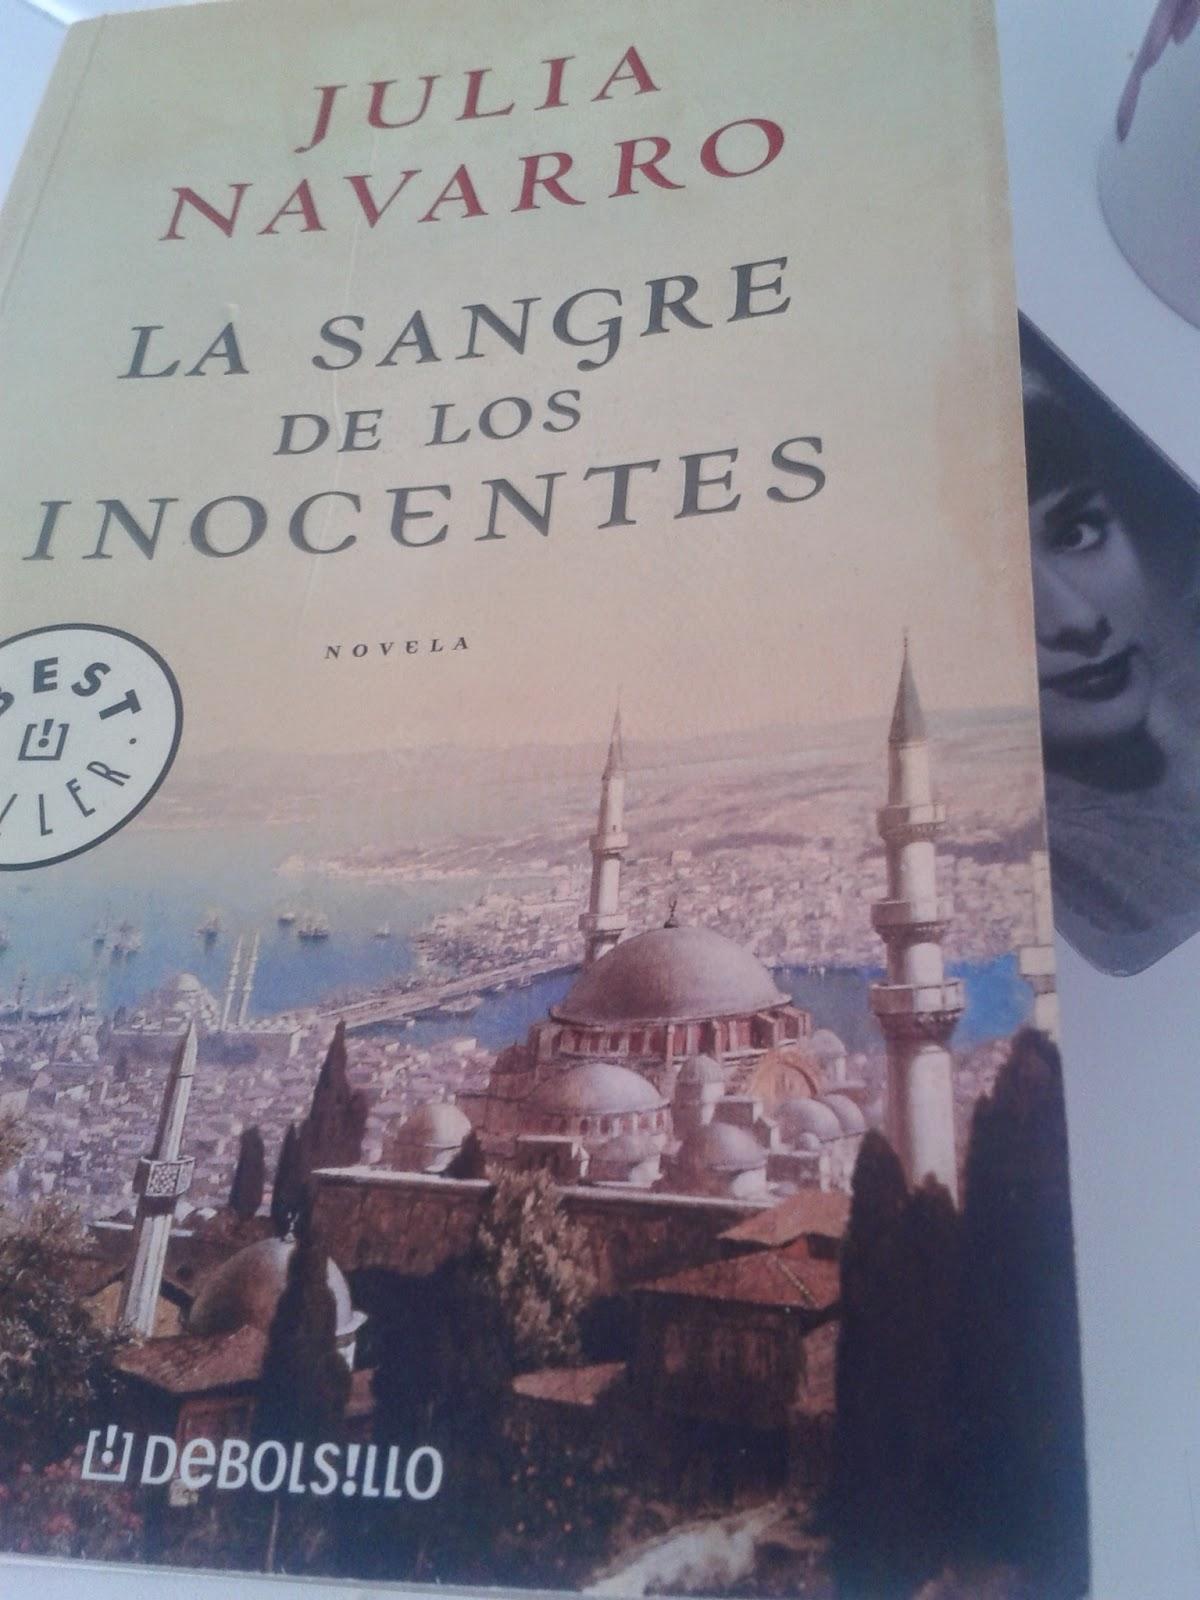 La sangre de los inocentes, de Julia Navarro. Raquel Atondo.